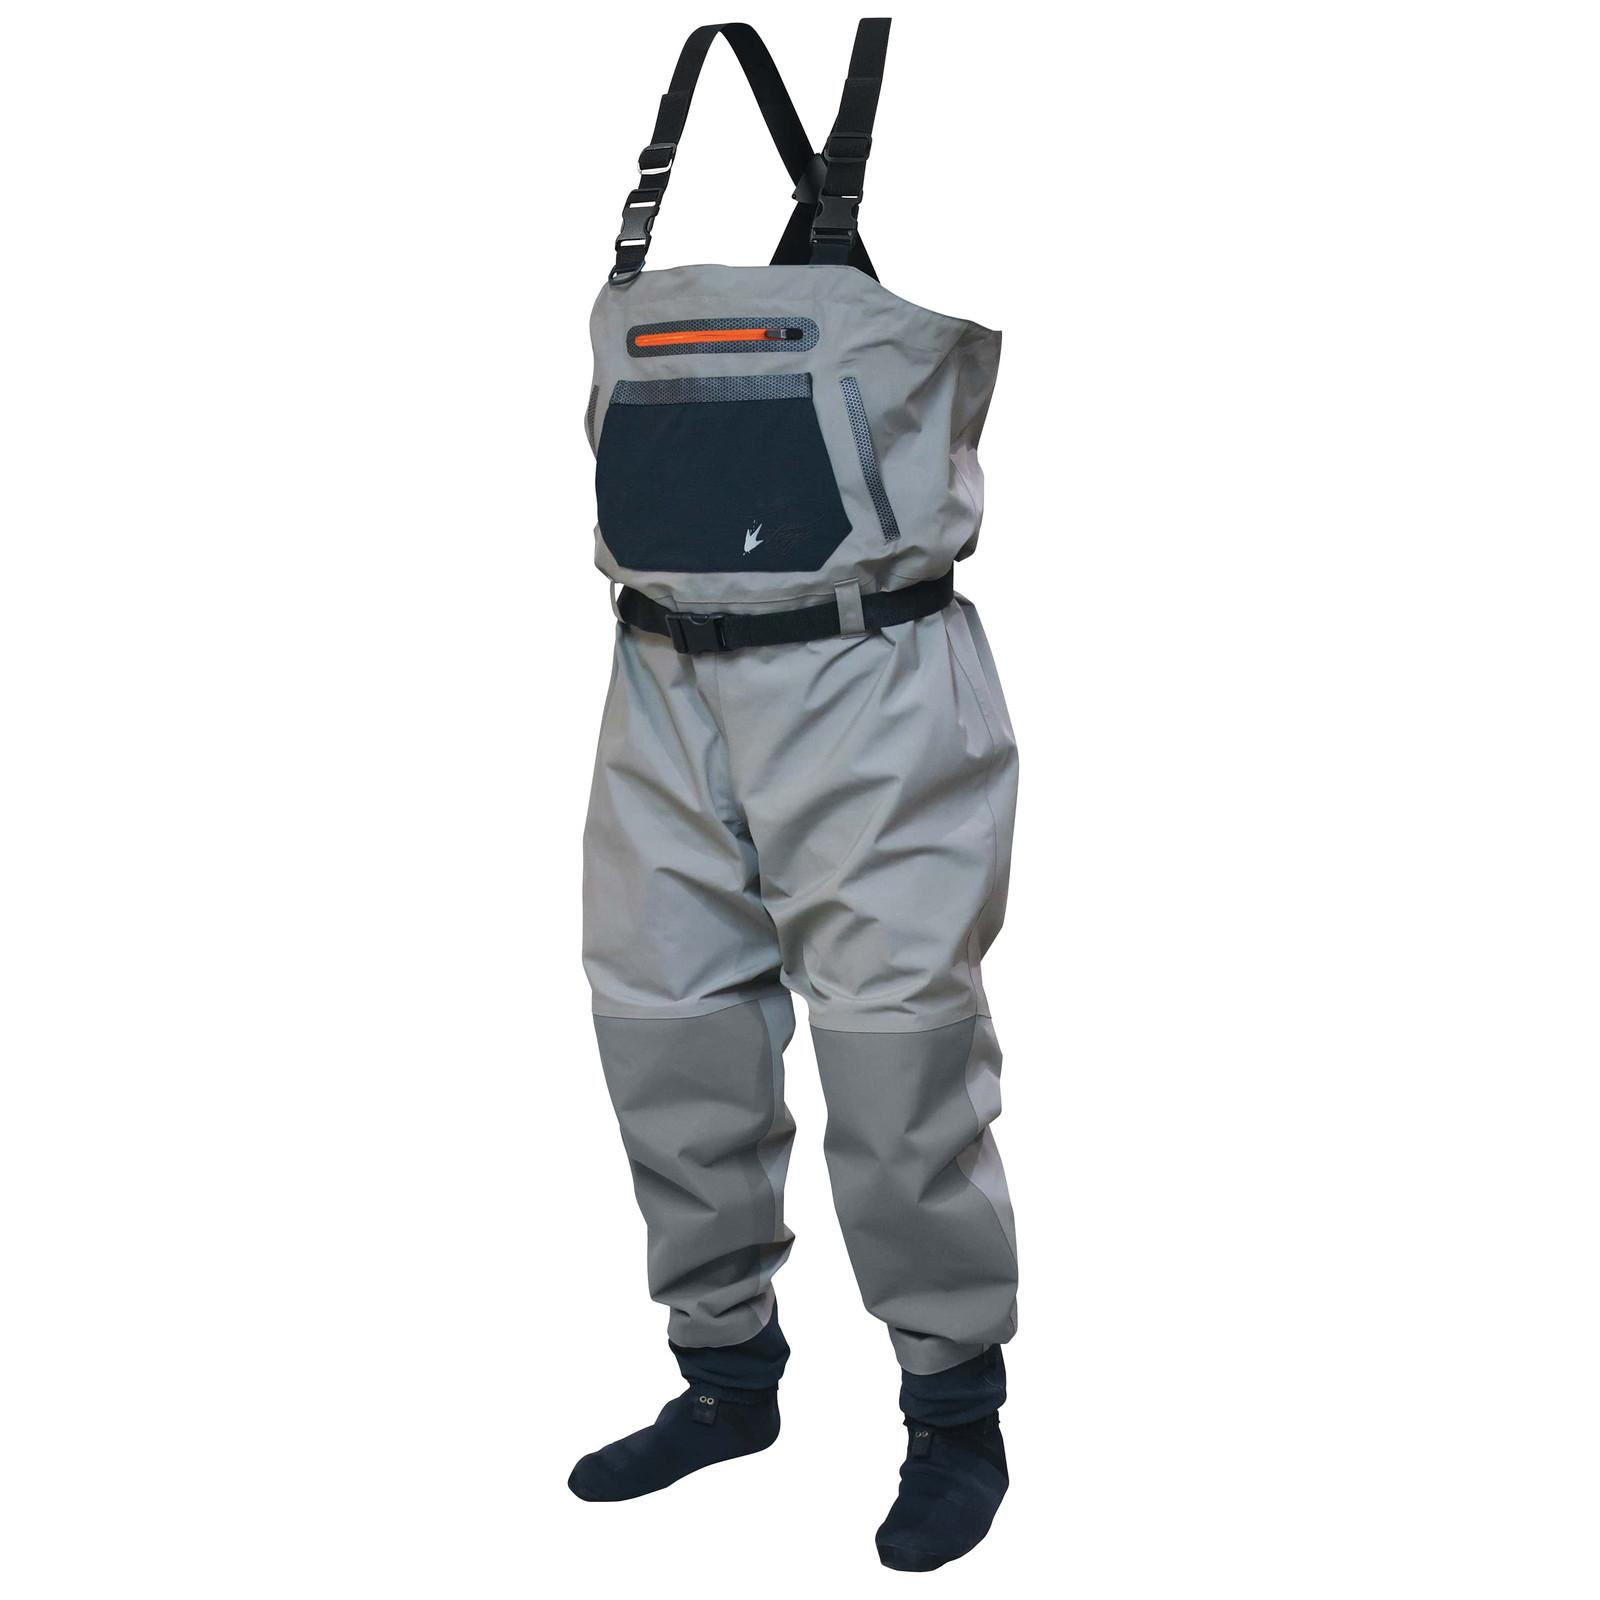 Sierran Reinforced Nylon Breathable Stockingfoot Wader | Slate / Gray